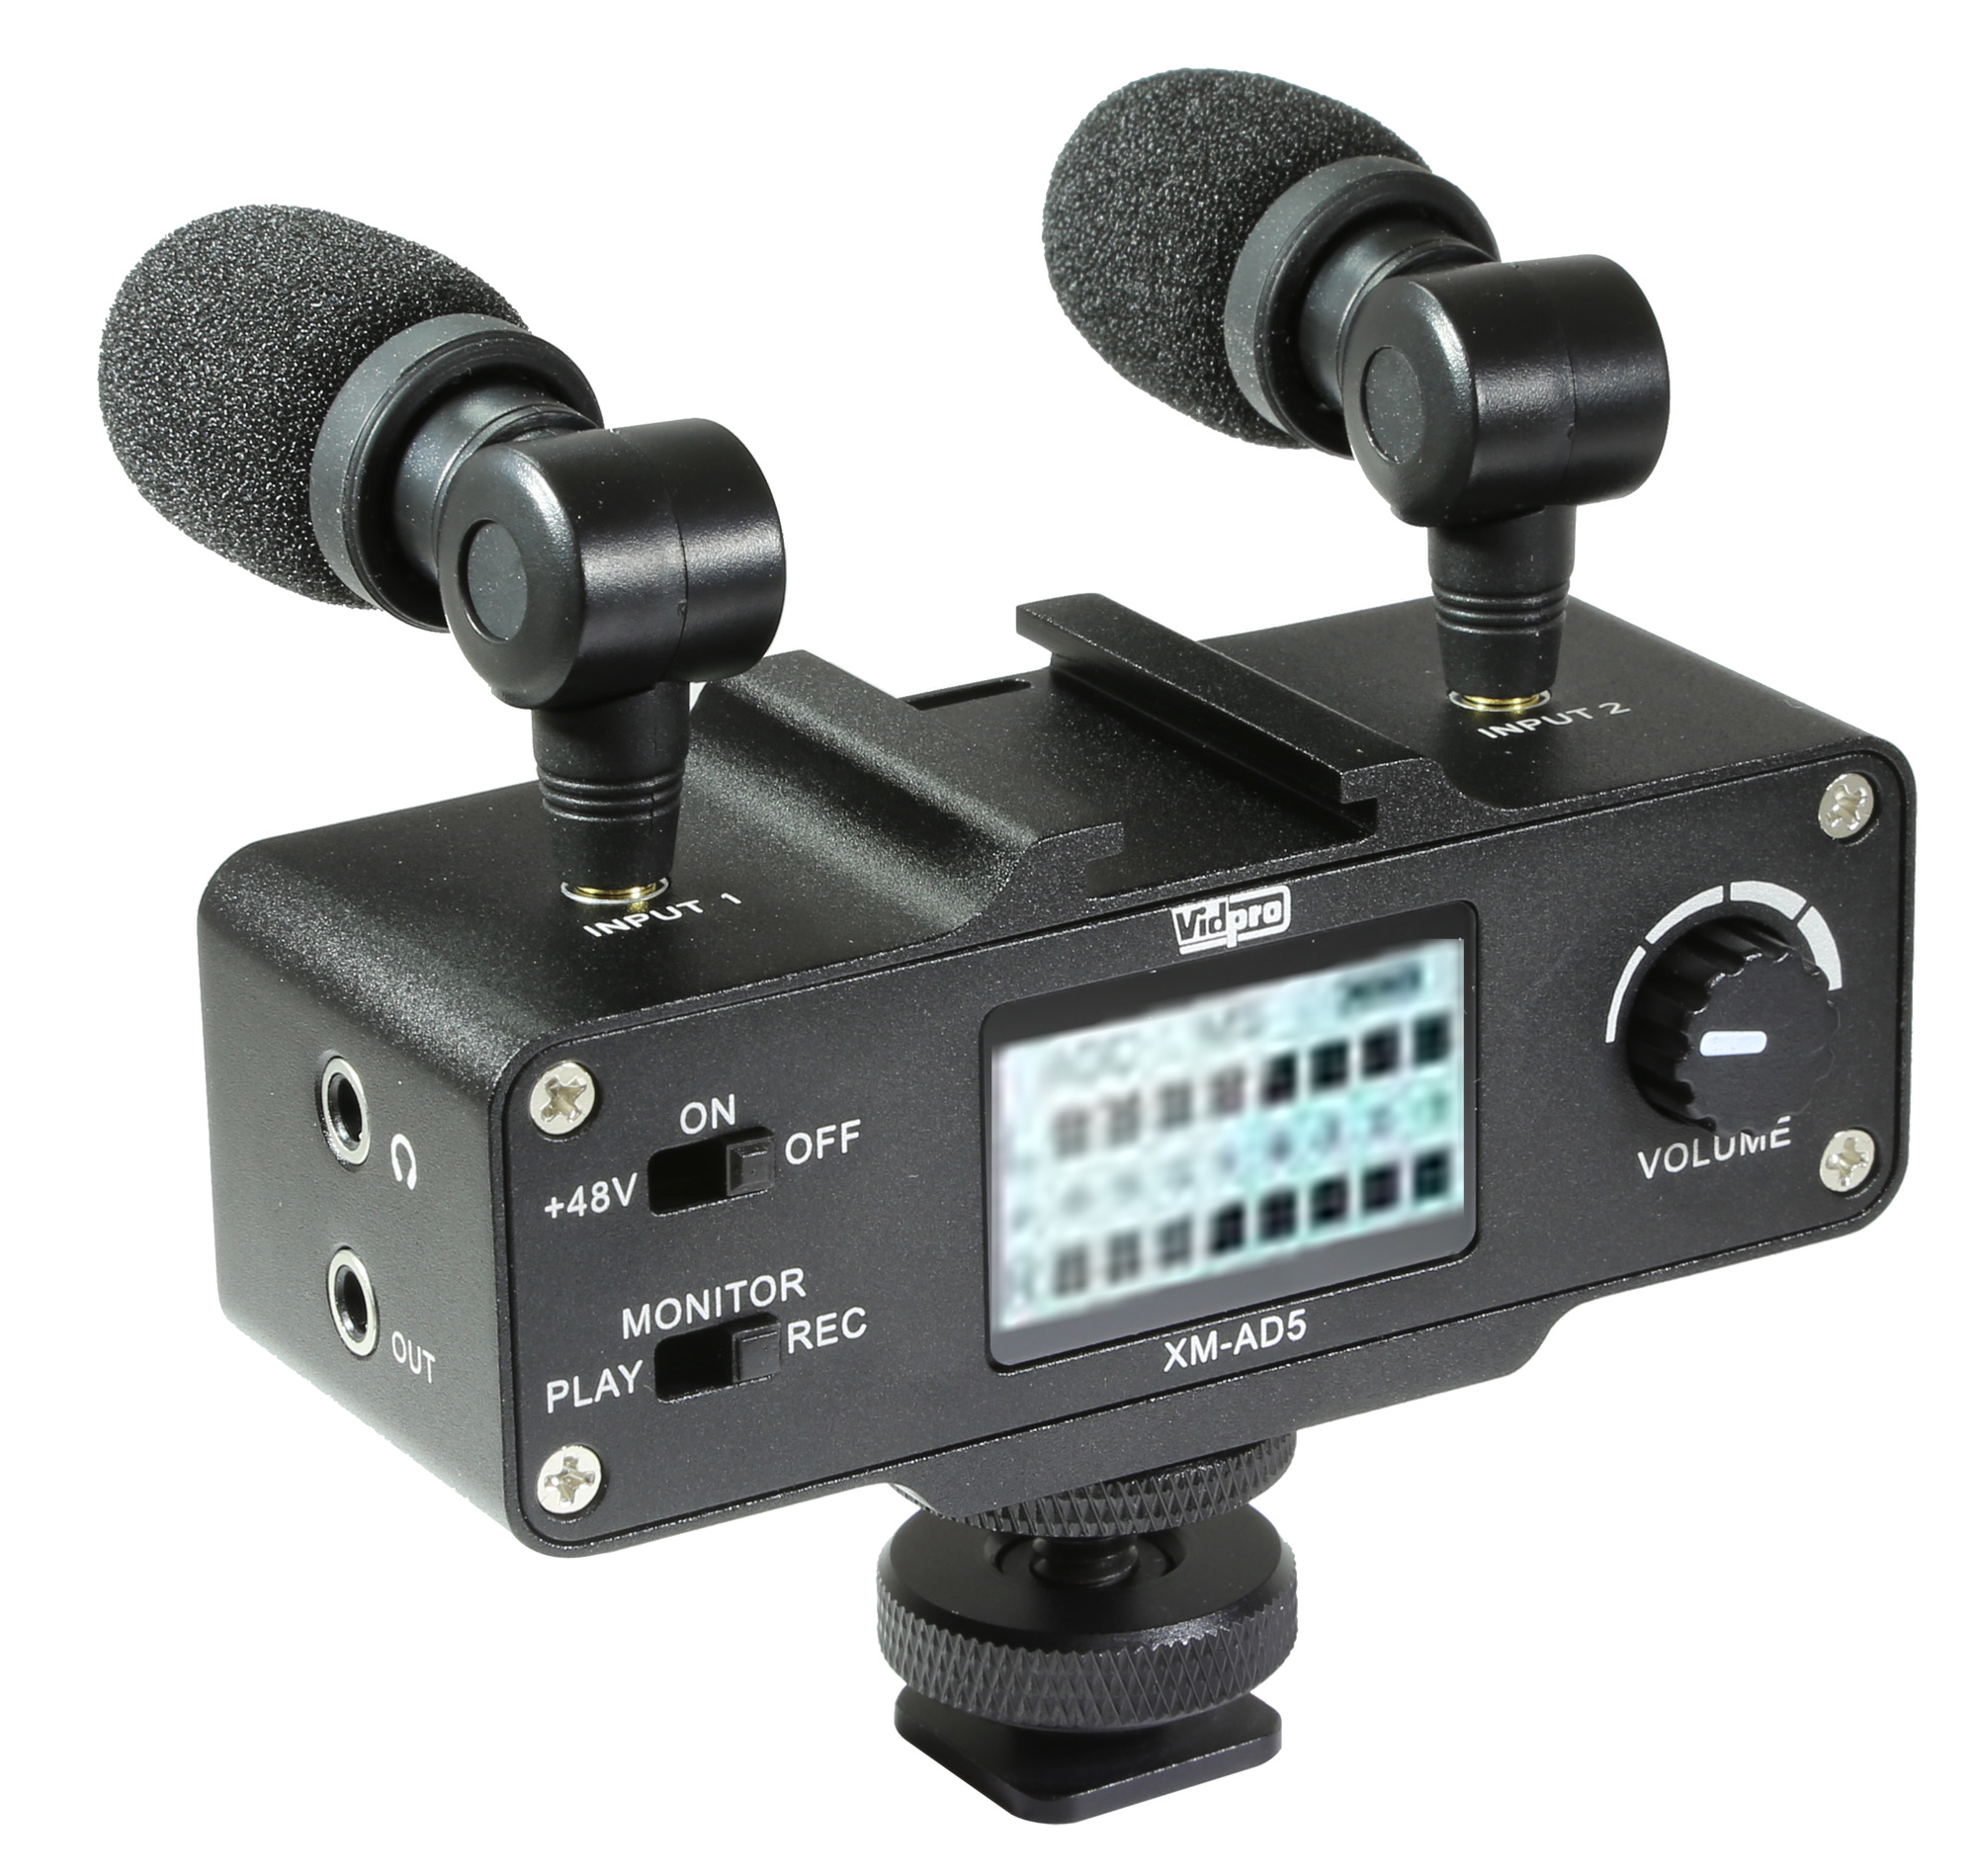 Vidpro XM-AD5 Mini Pre-Amp Smart Mixer with Dual Condenser Microphones for  DSLR's, Video Cameras ...